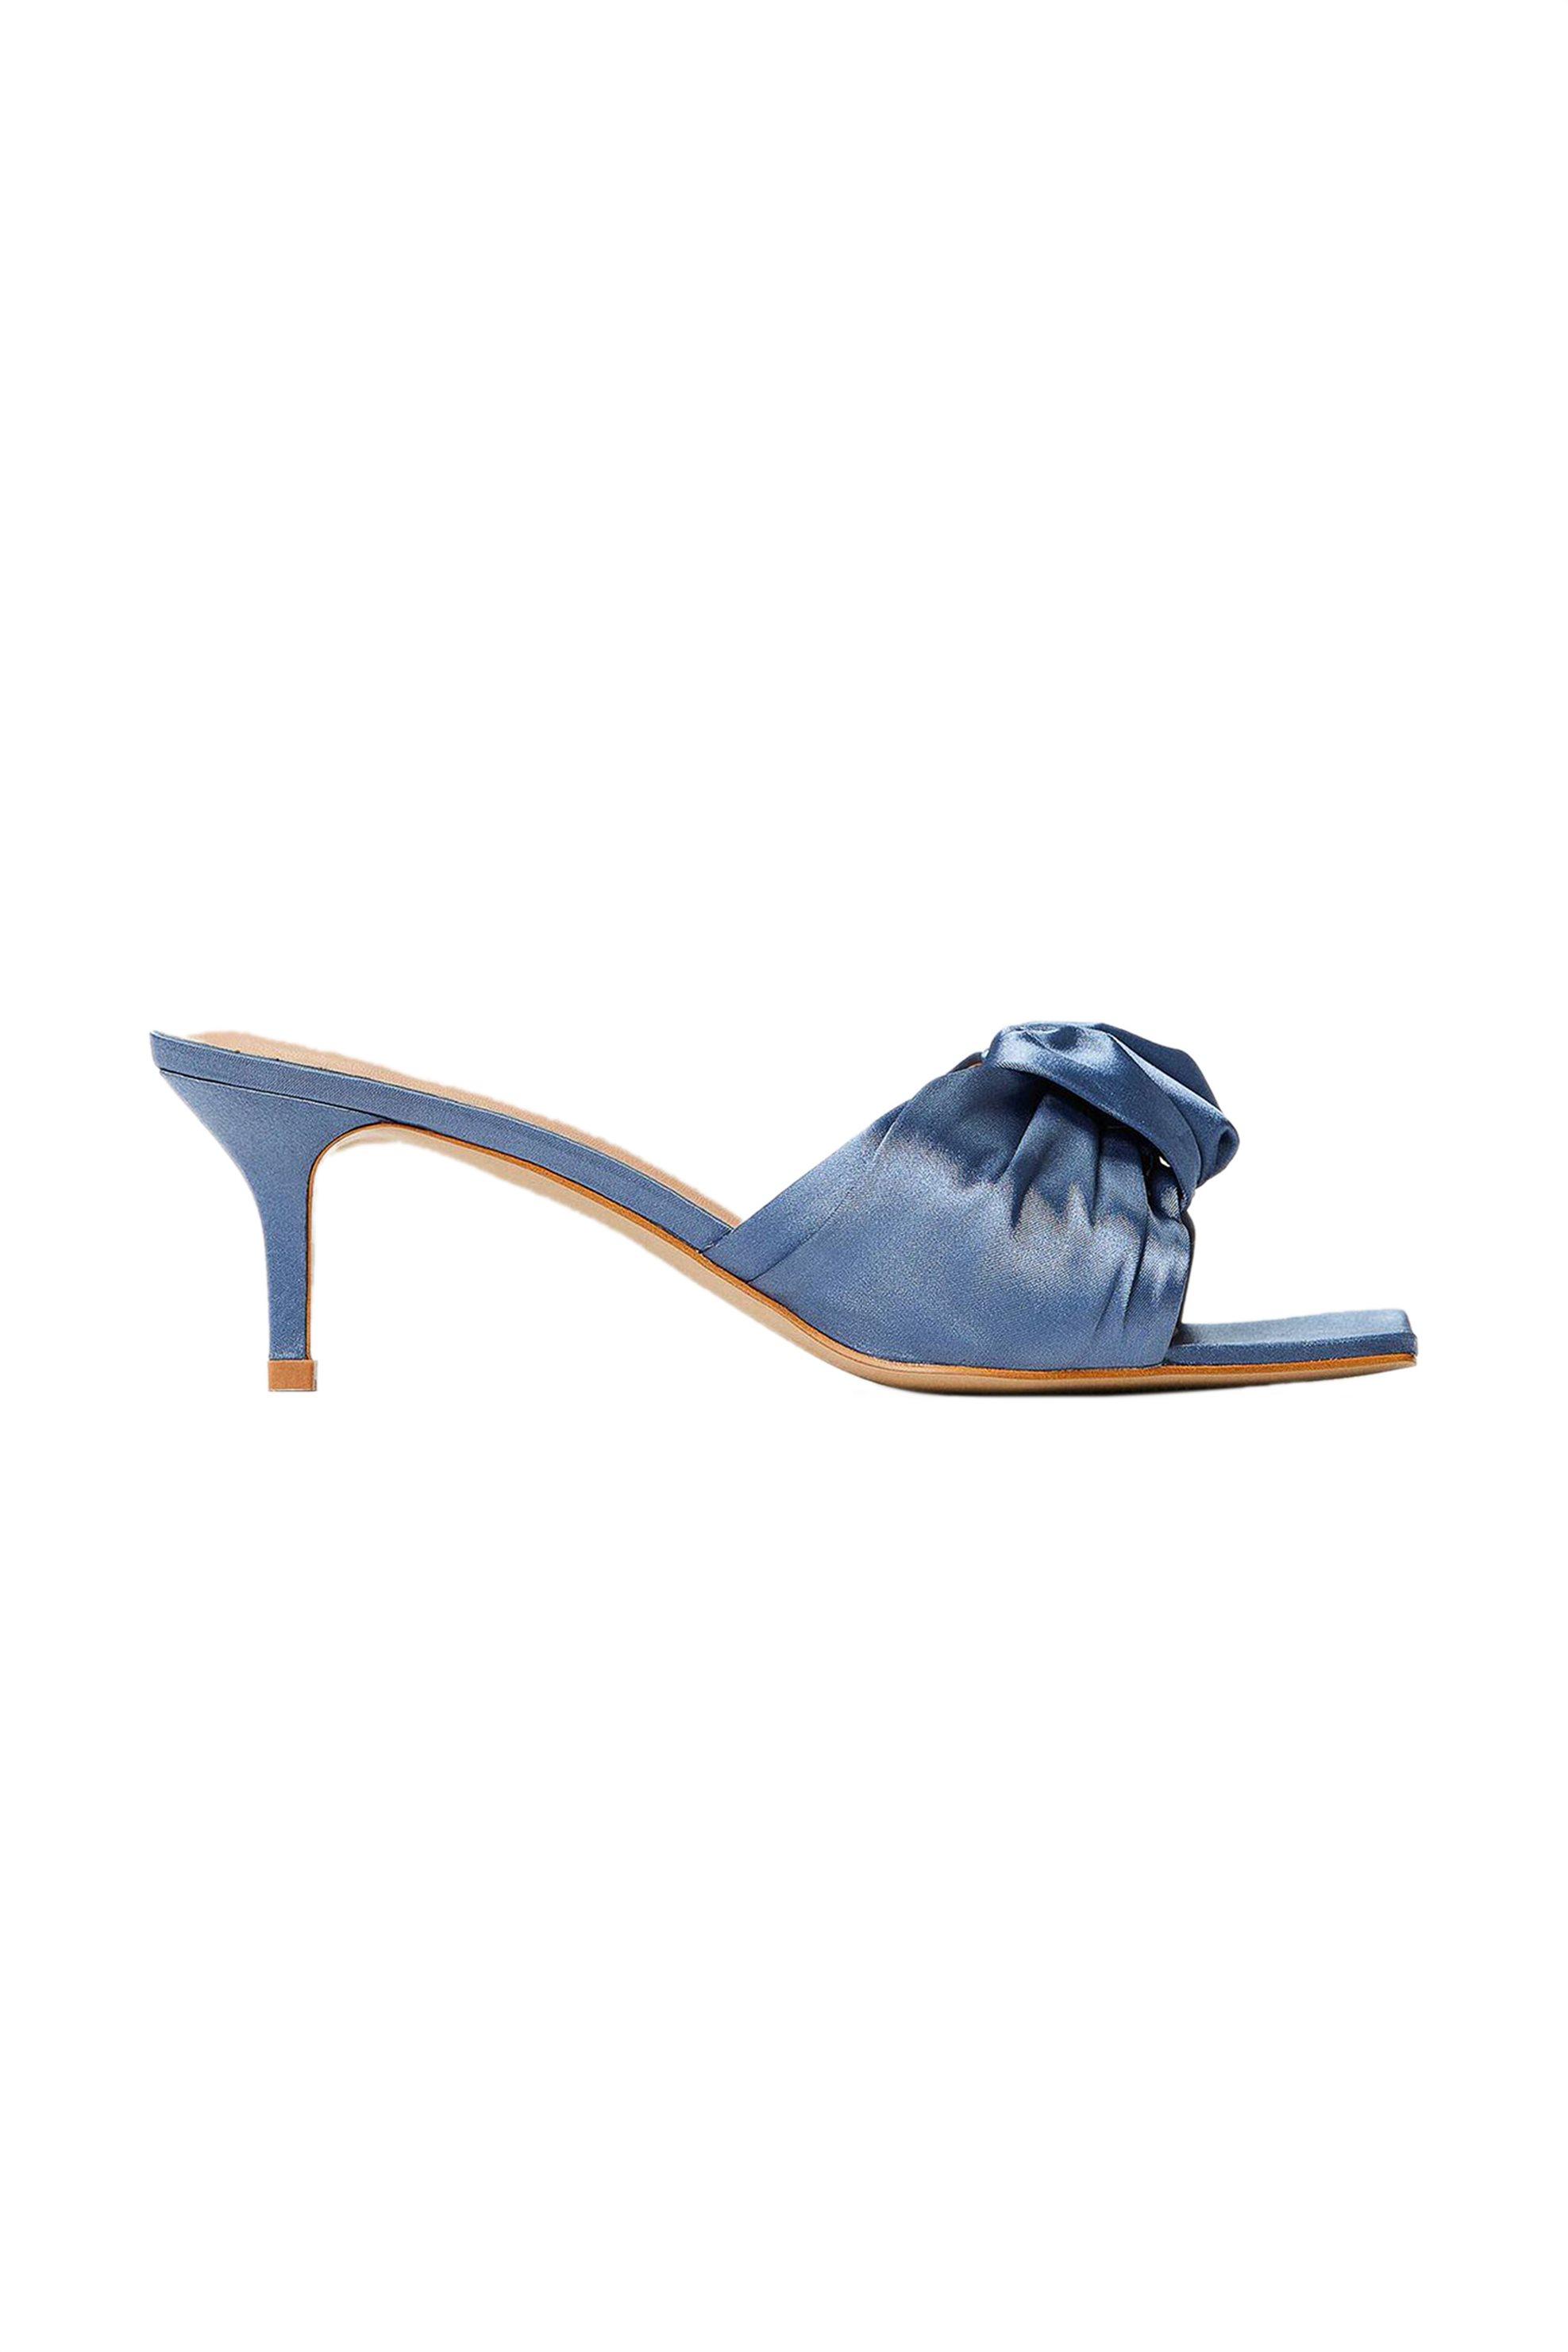 Twinset γυναικεία mules σατινέ με διακοσμητικό δέσιμο – 211TCT114 – Μπλε